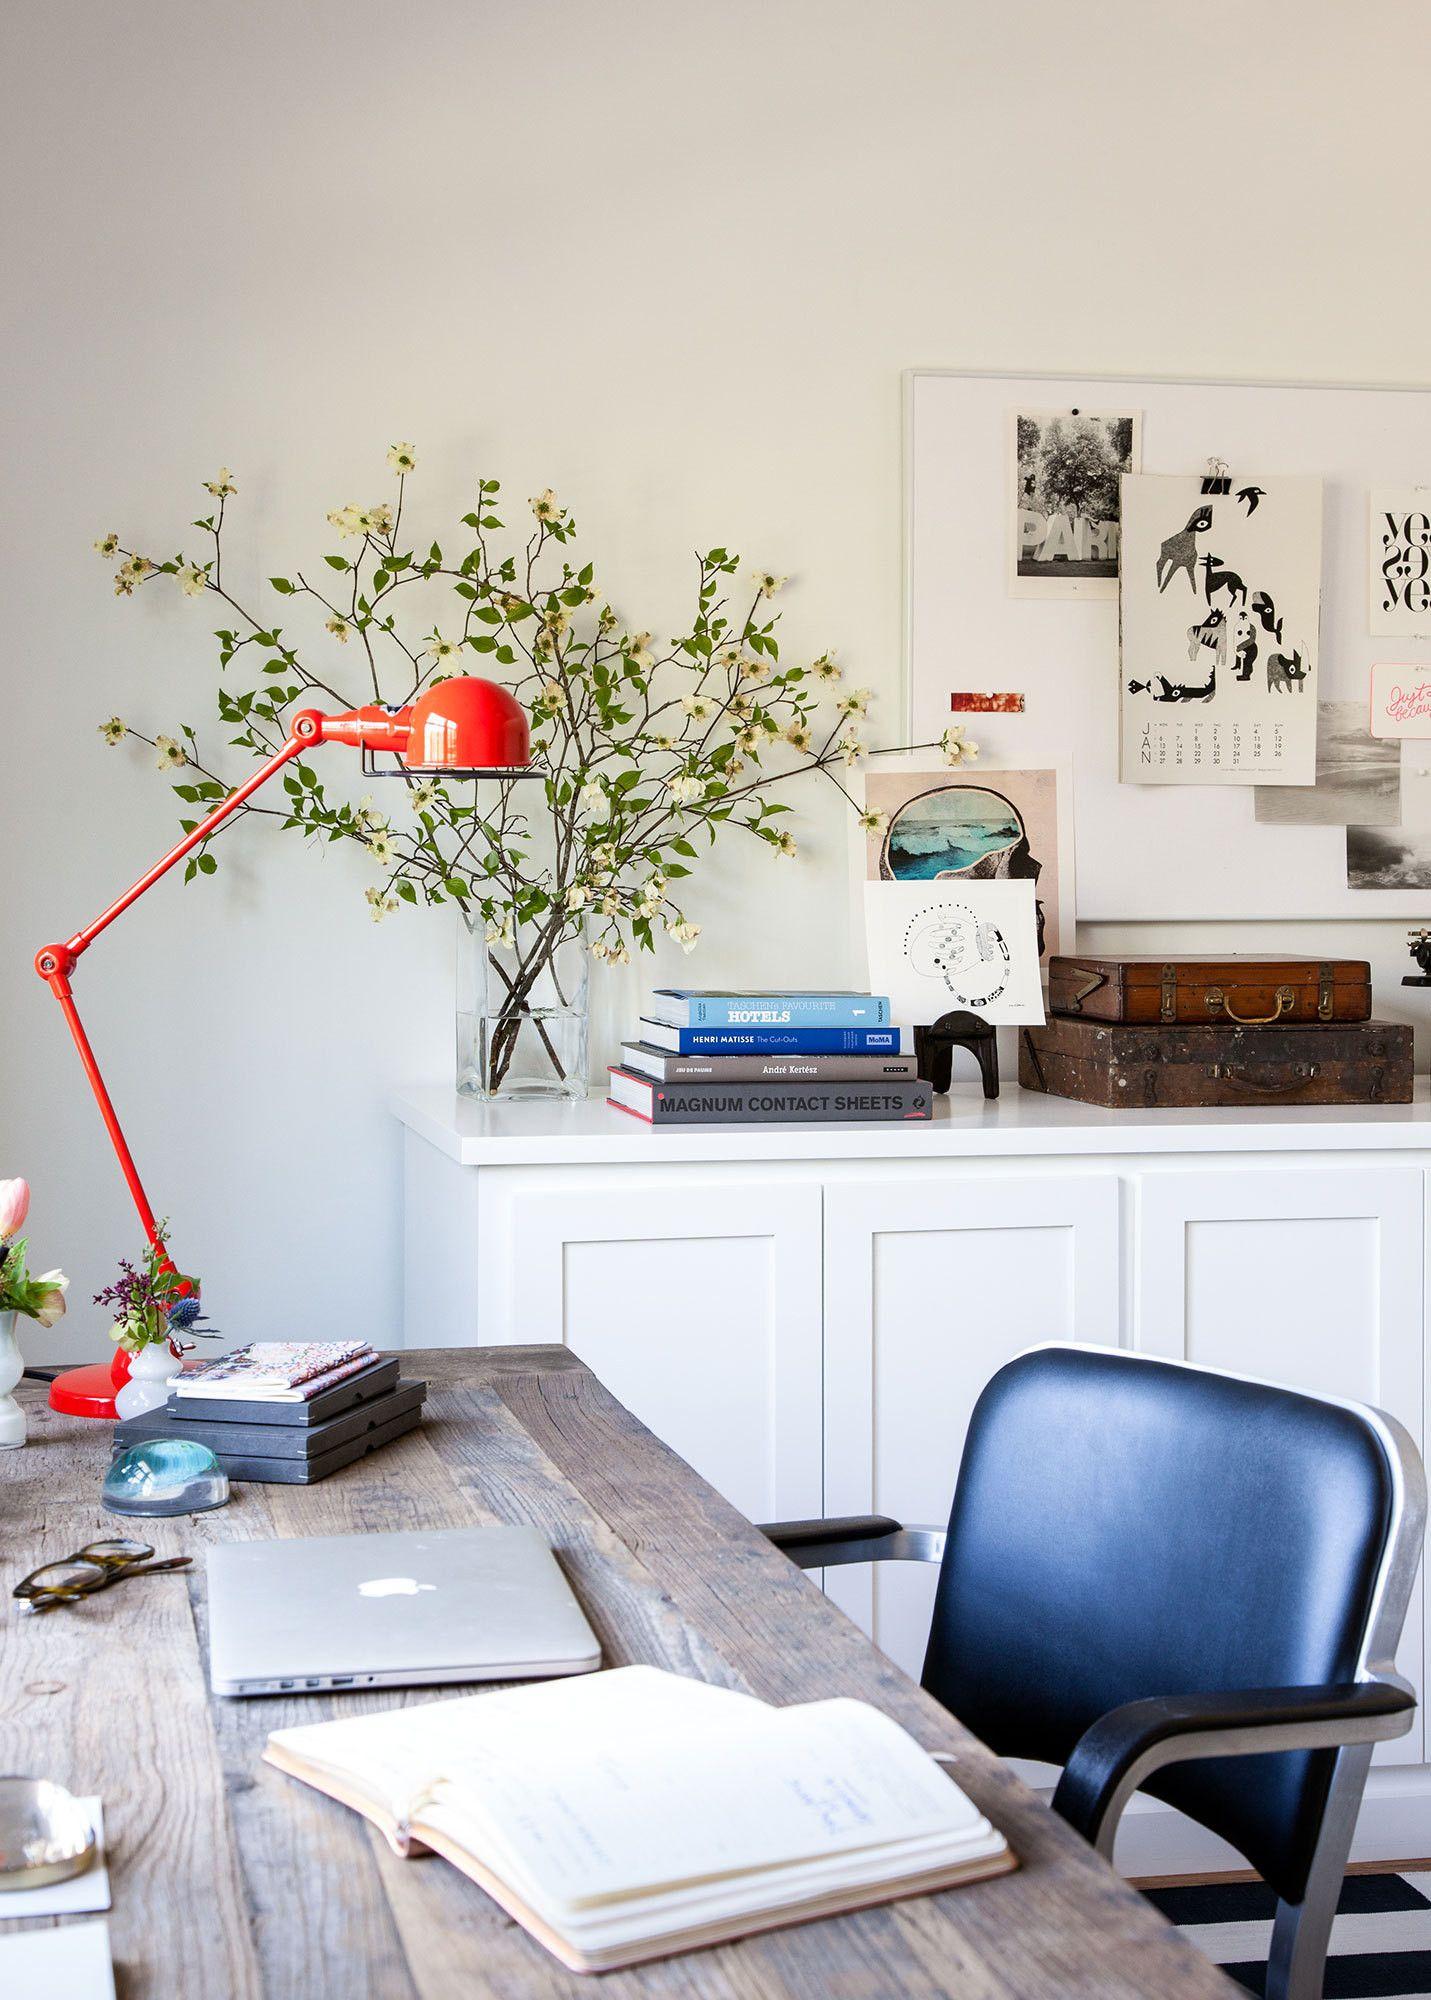 scandinavian sensibilities find a home in nashville bureauxatelierbureau de bureaumobilier